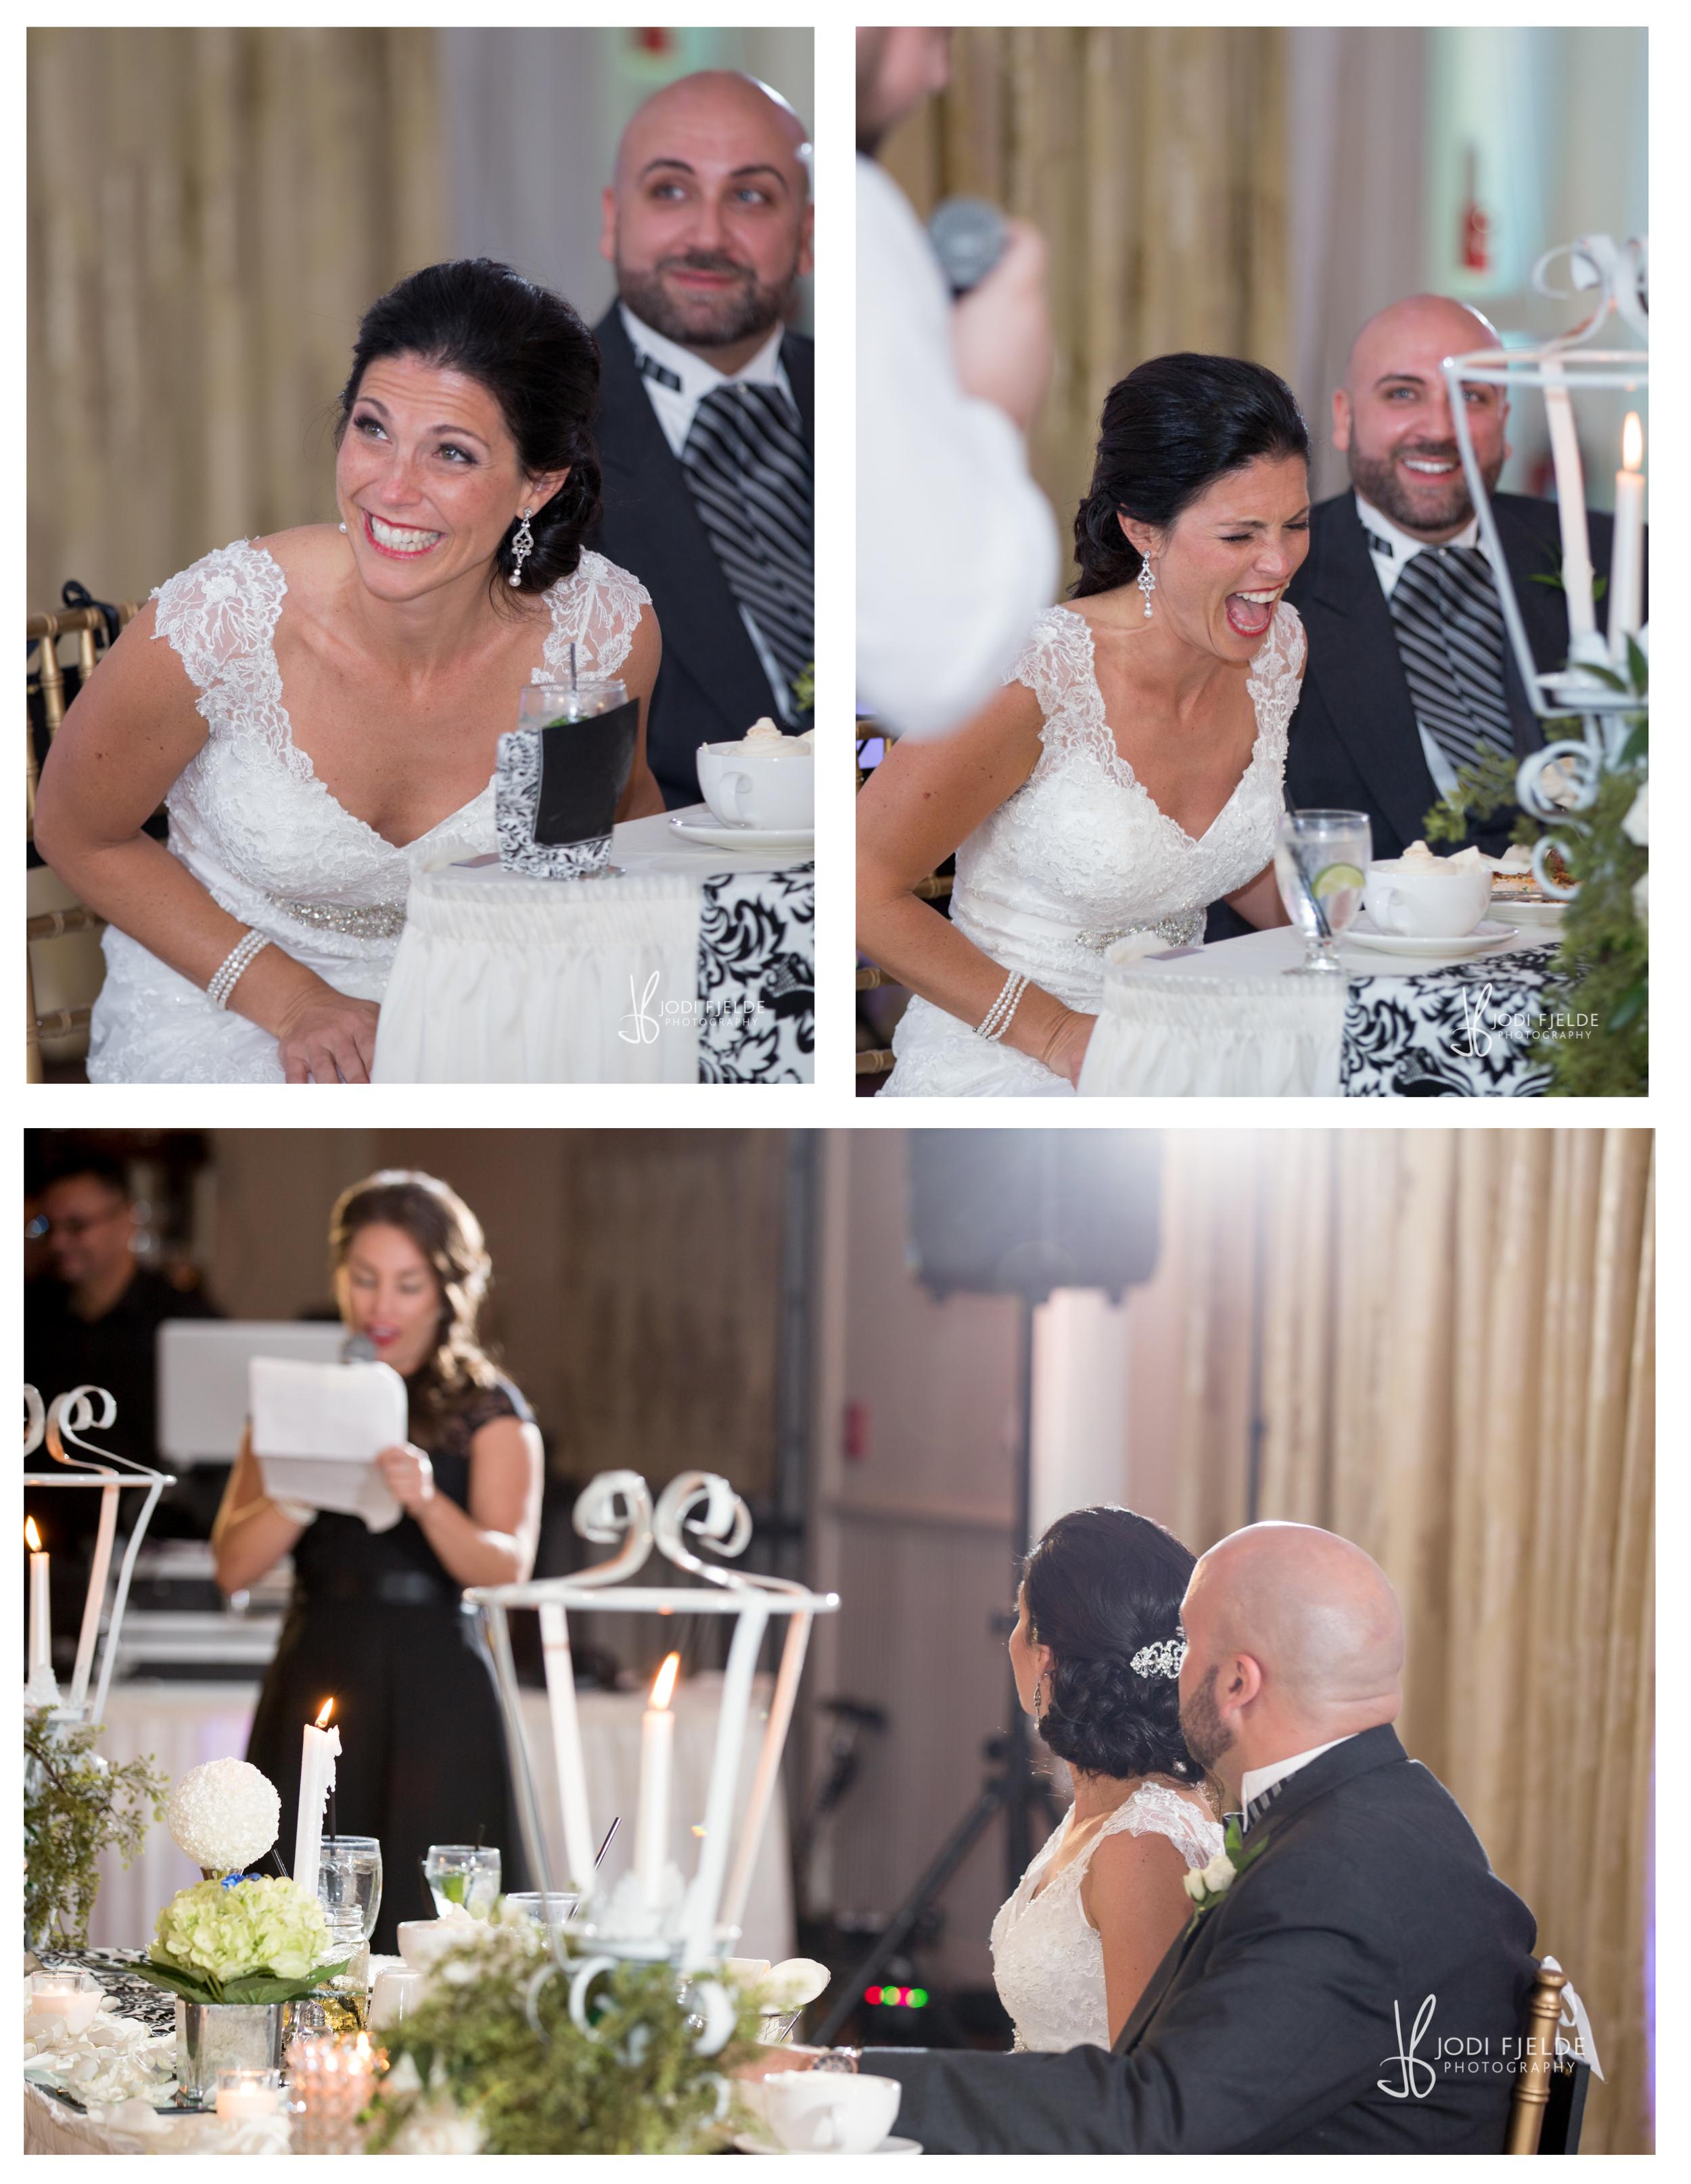 Highland_Manor_Apopka_Florida_wedding_Jackie_&_Tim_photography_jodi_Fjelde_photography-30.jpg